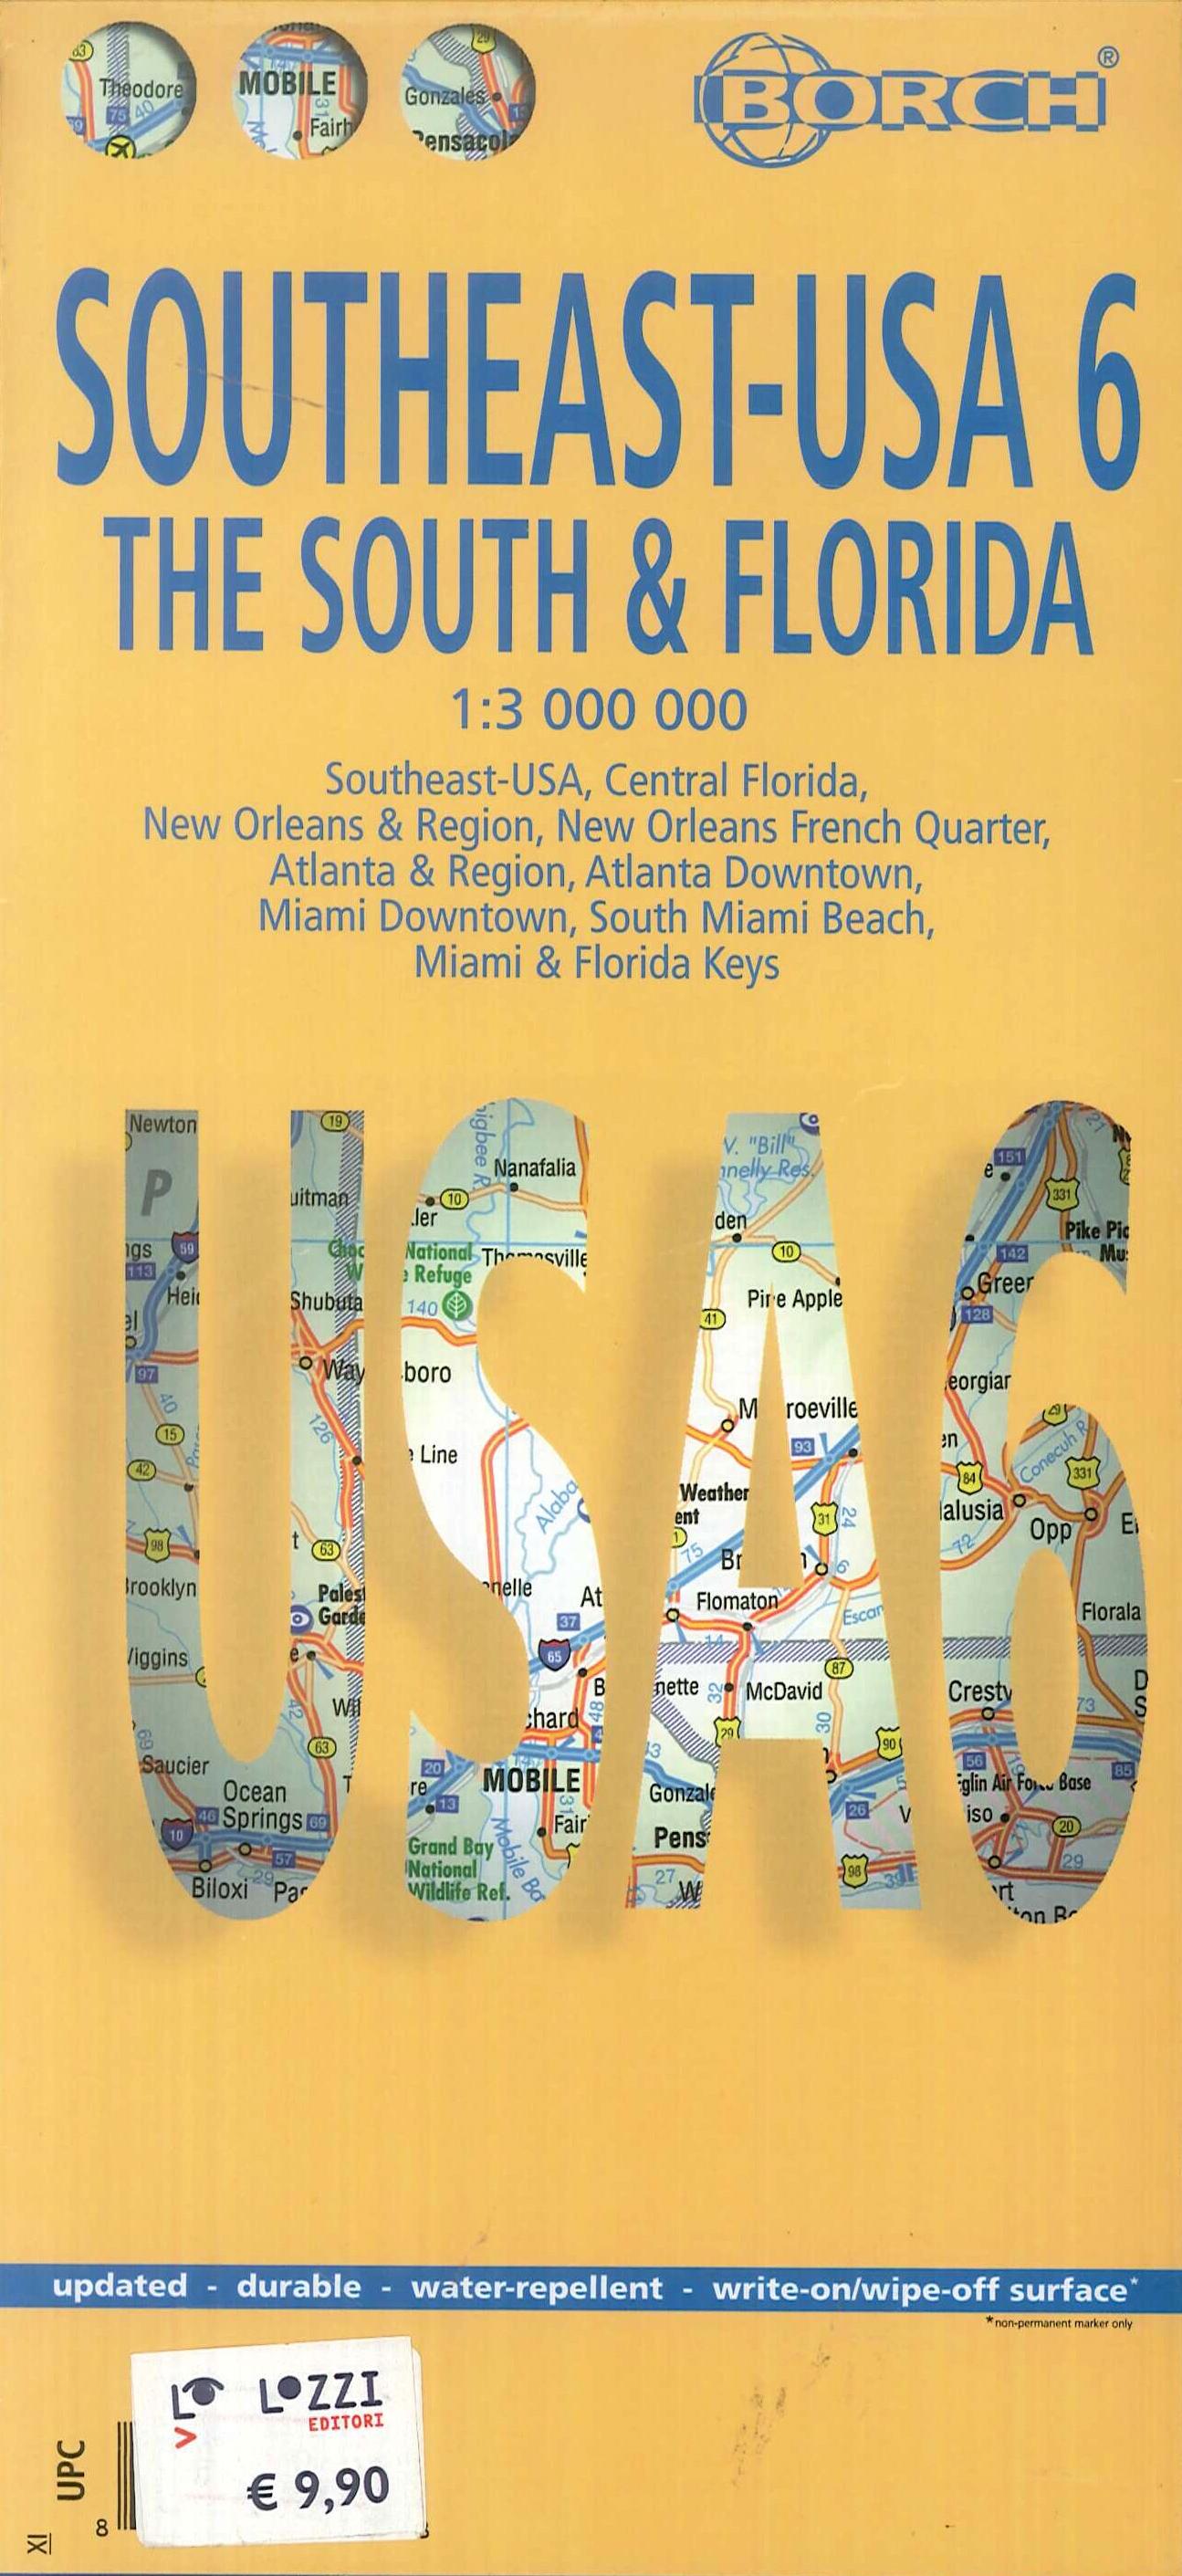 Southeast Usa 6. The South & Florida. 1:3 000 000